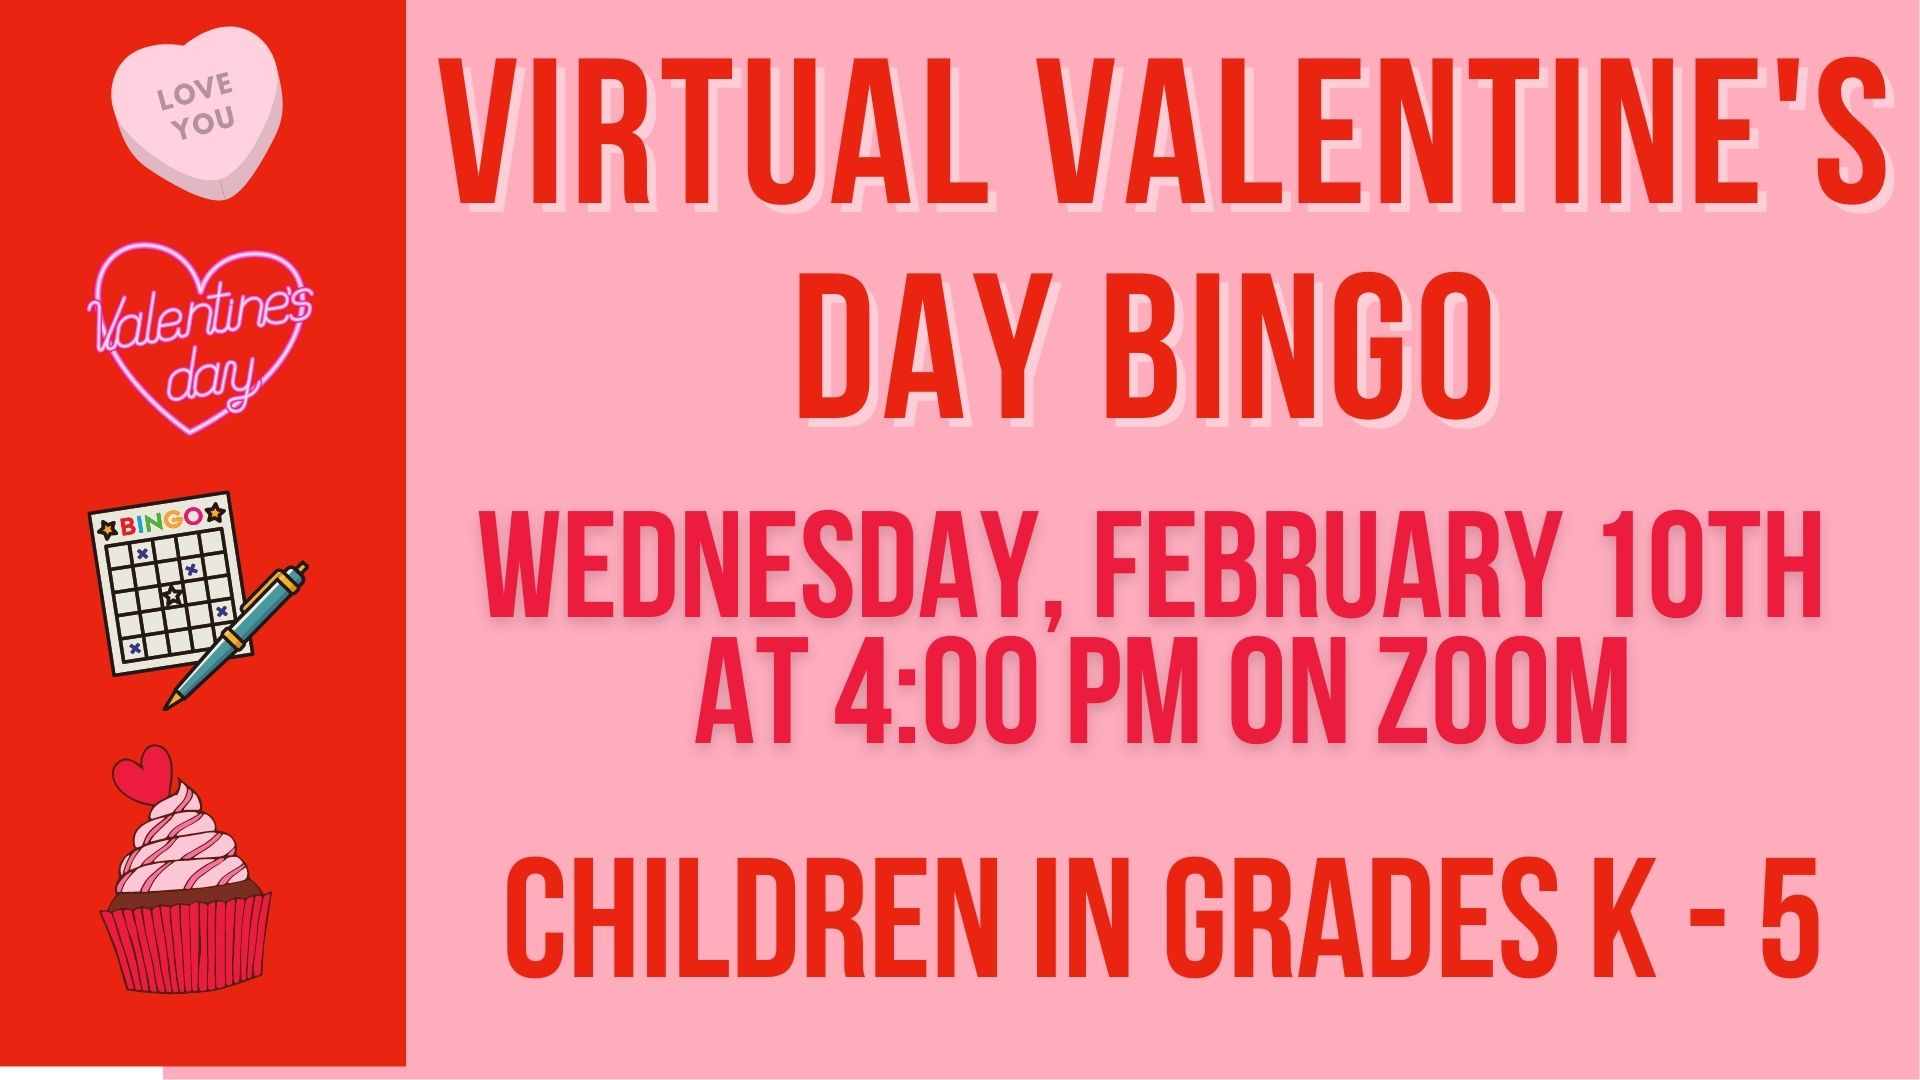 virtual valentine's day bingo